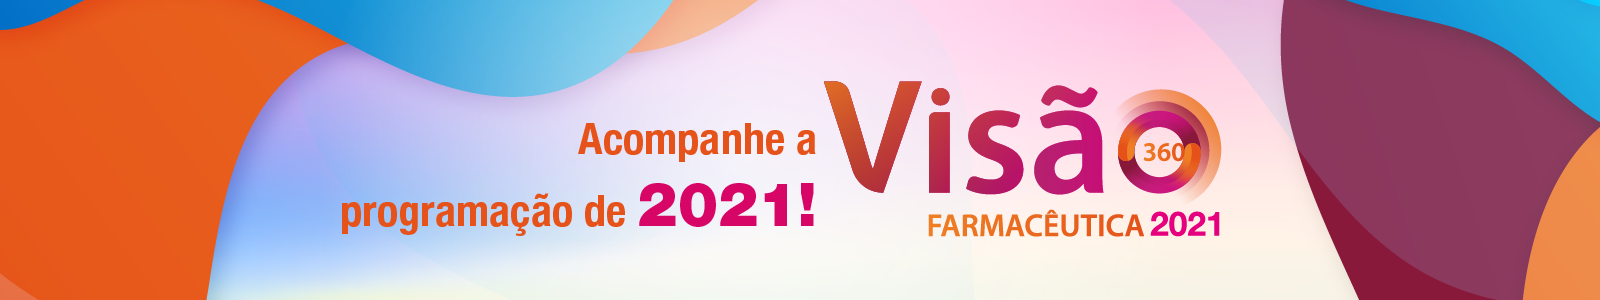 VF2021-banners-Prancheta 1